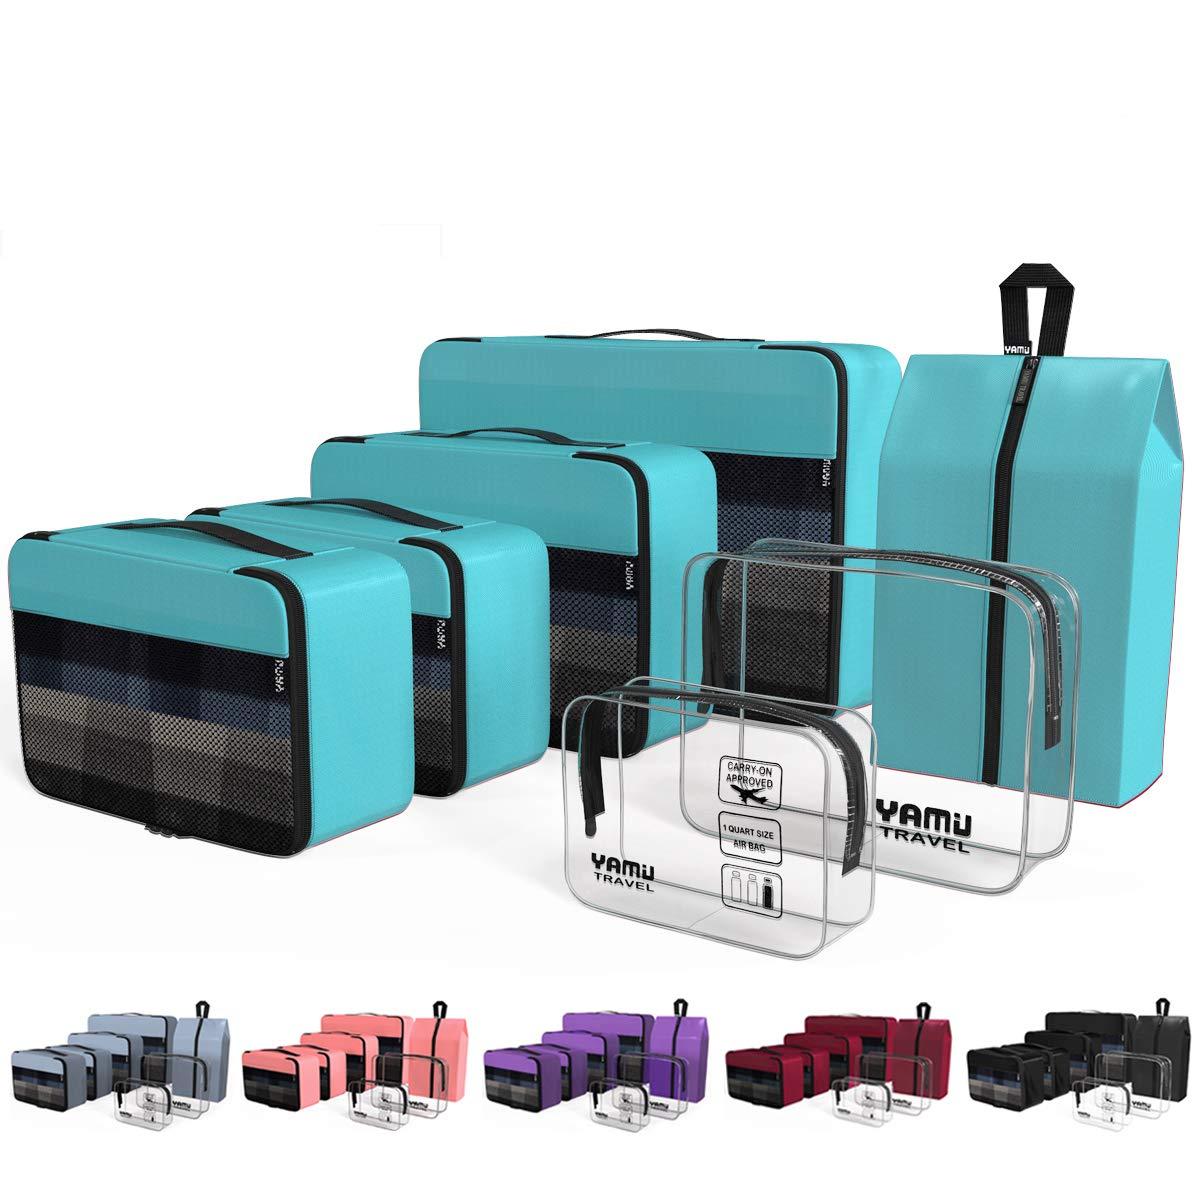 YAMIU Packing Cubes 7-Pcs Travel Organizer Accessories with Shoe Bag & 2 Toiletry Bags(Blue) by YAMIU